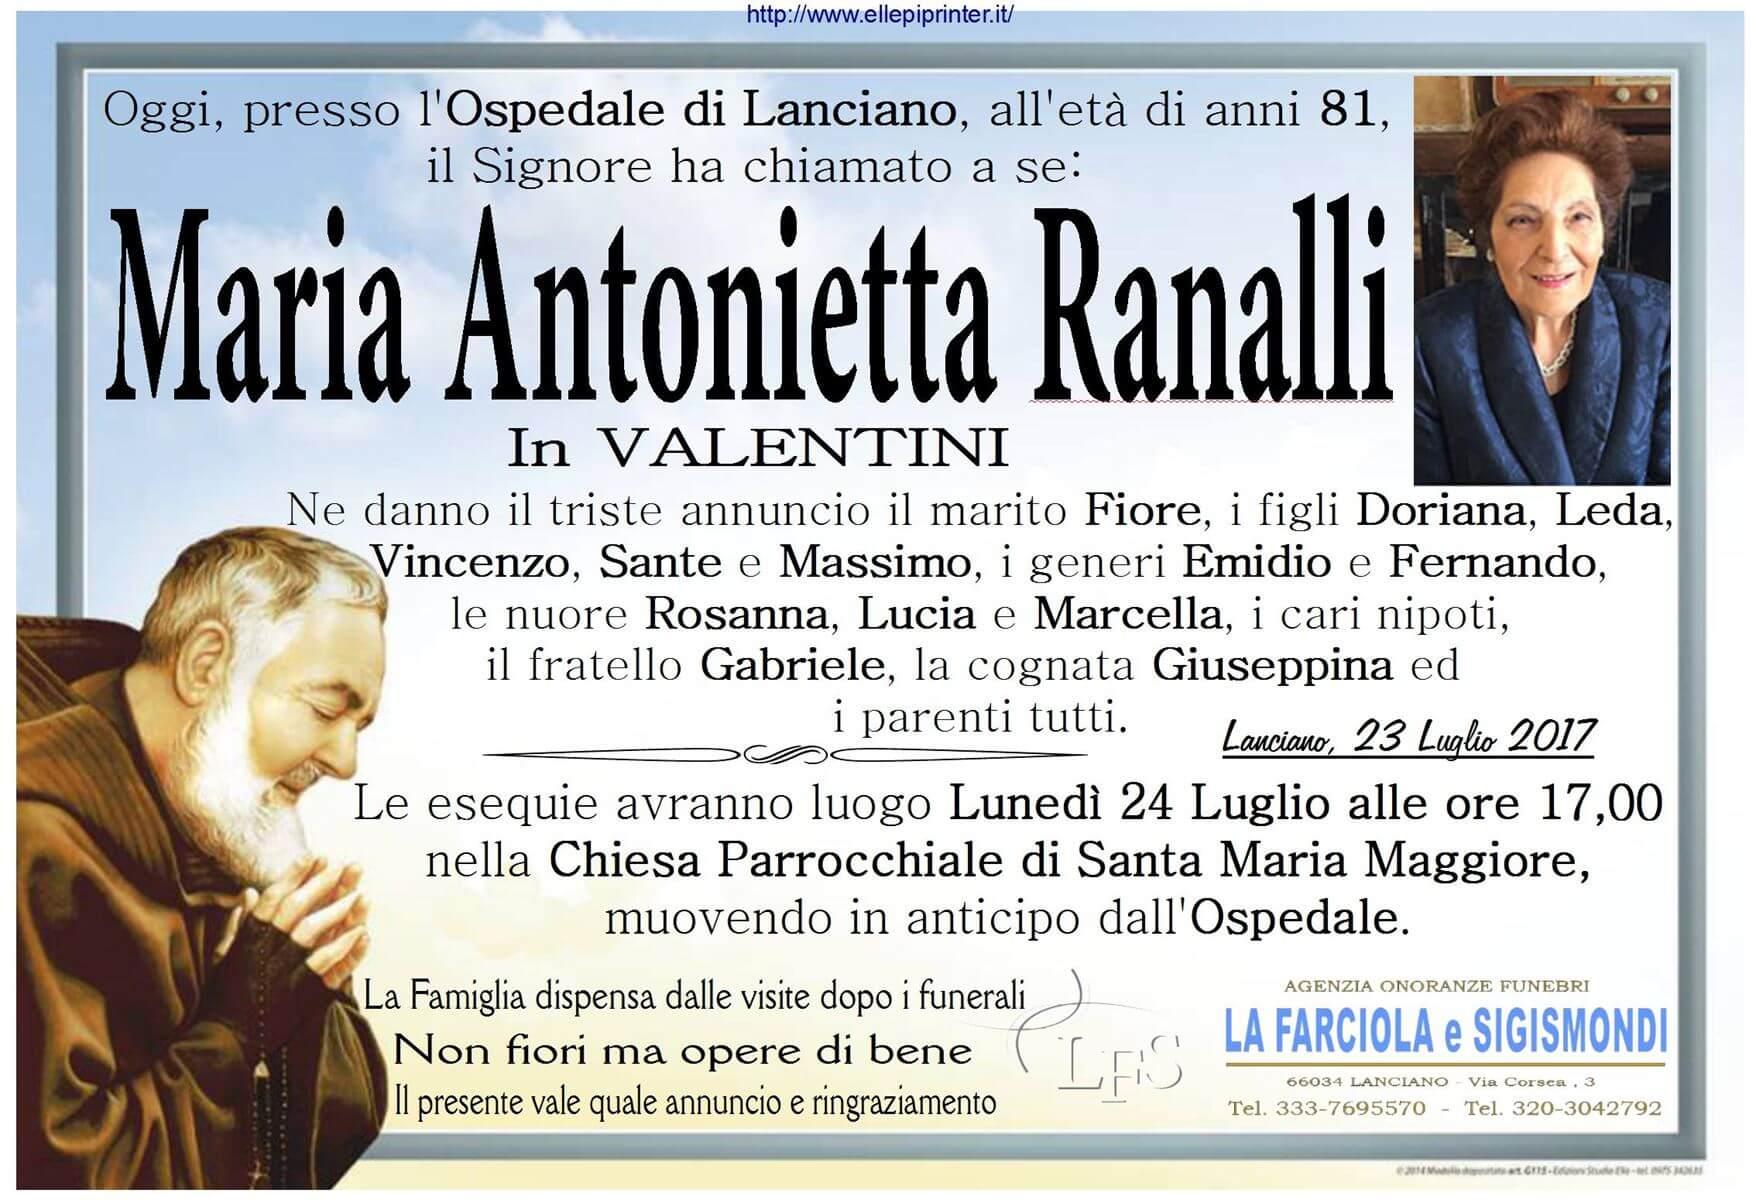 Necrologio Lanciano - Maria Antonietta Ranalli